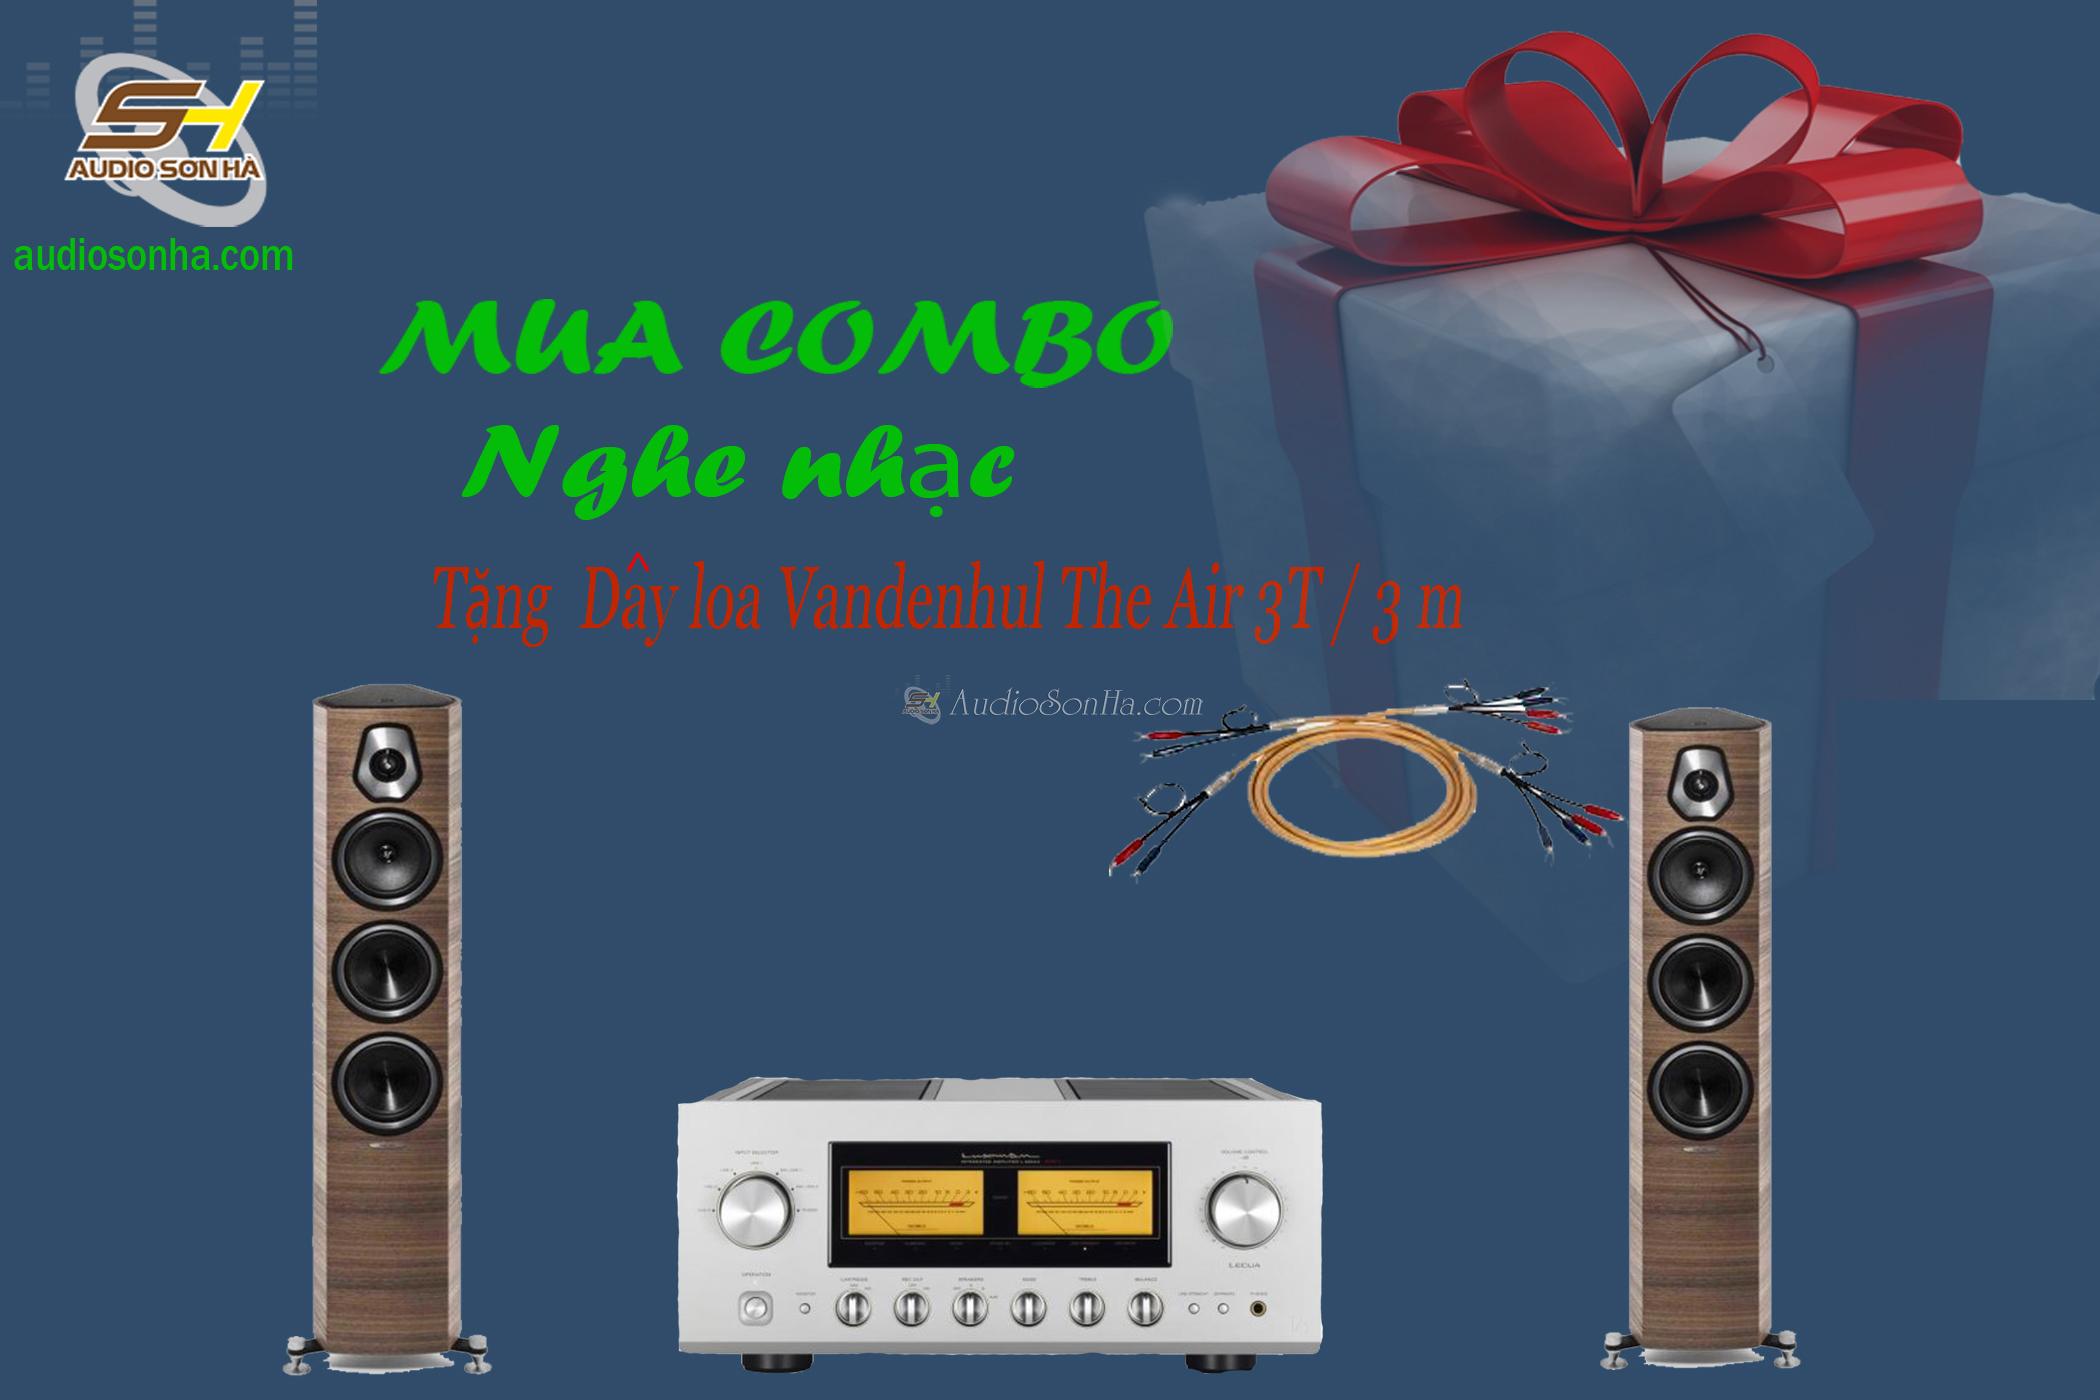 Hệ thống nghe nhạc Amplifier Luxman L-590AX II / Sonus Faber Sonetto III